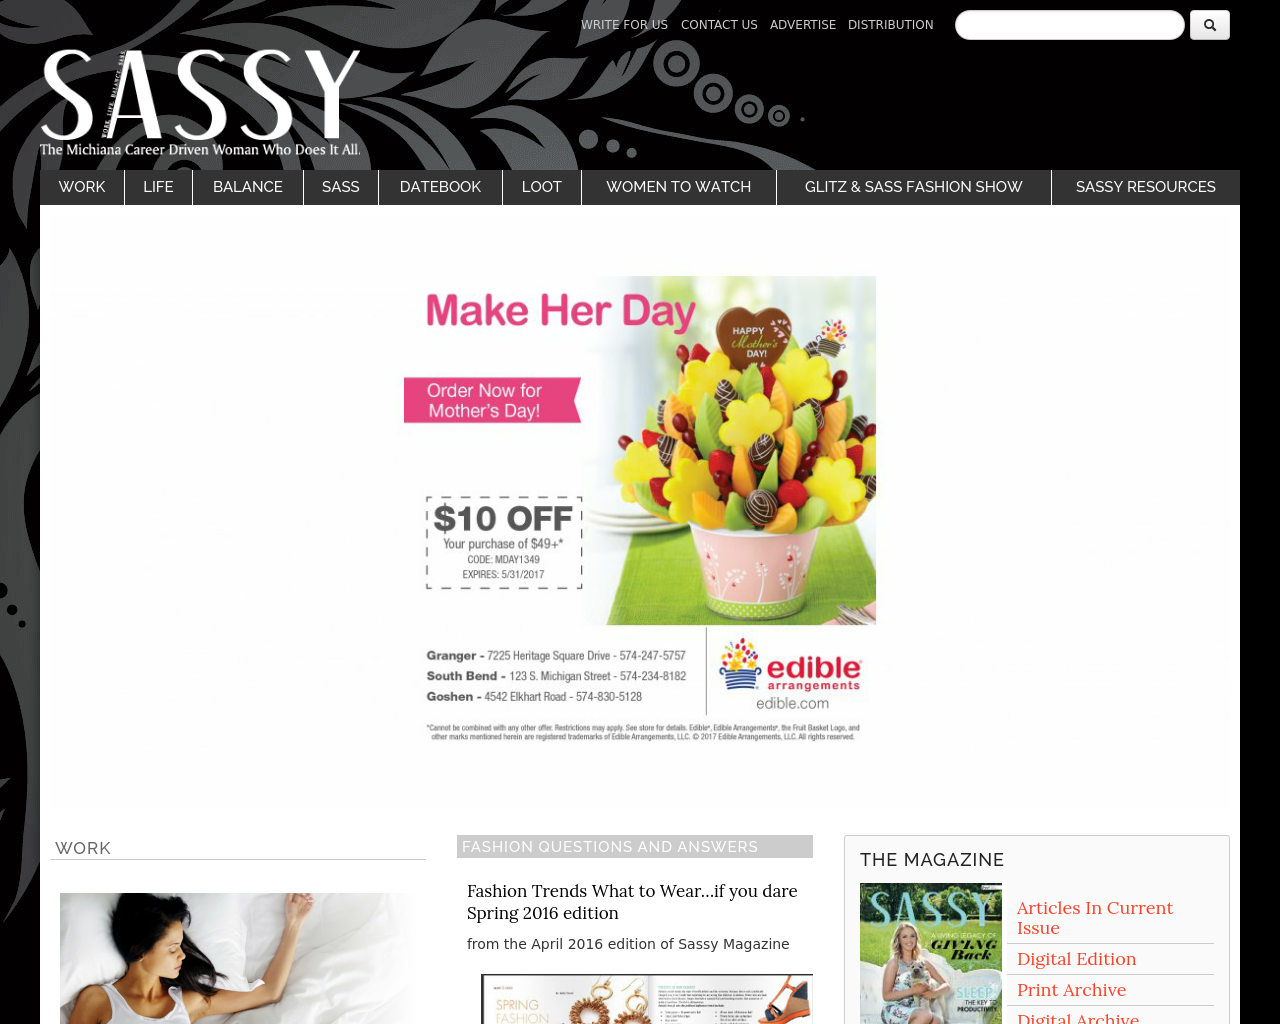 Sassy-Advertising-Reviews-Pricing